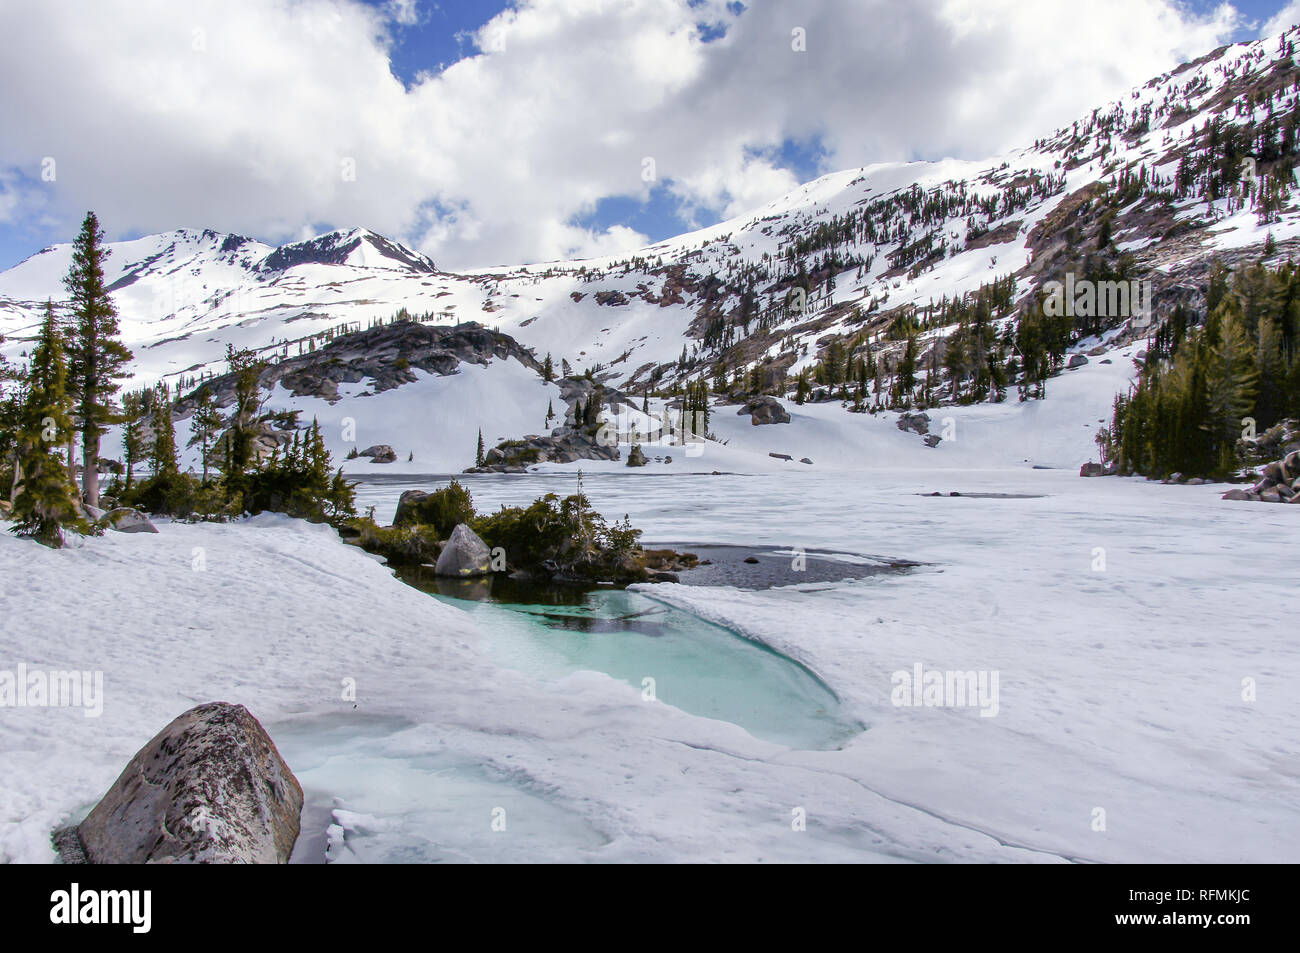 Views of frozen Fontanillis Lake and Dicks Peak in late Spring. - Stock Image